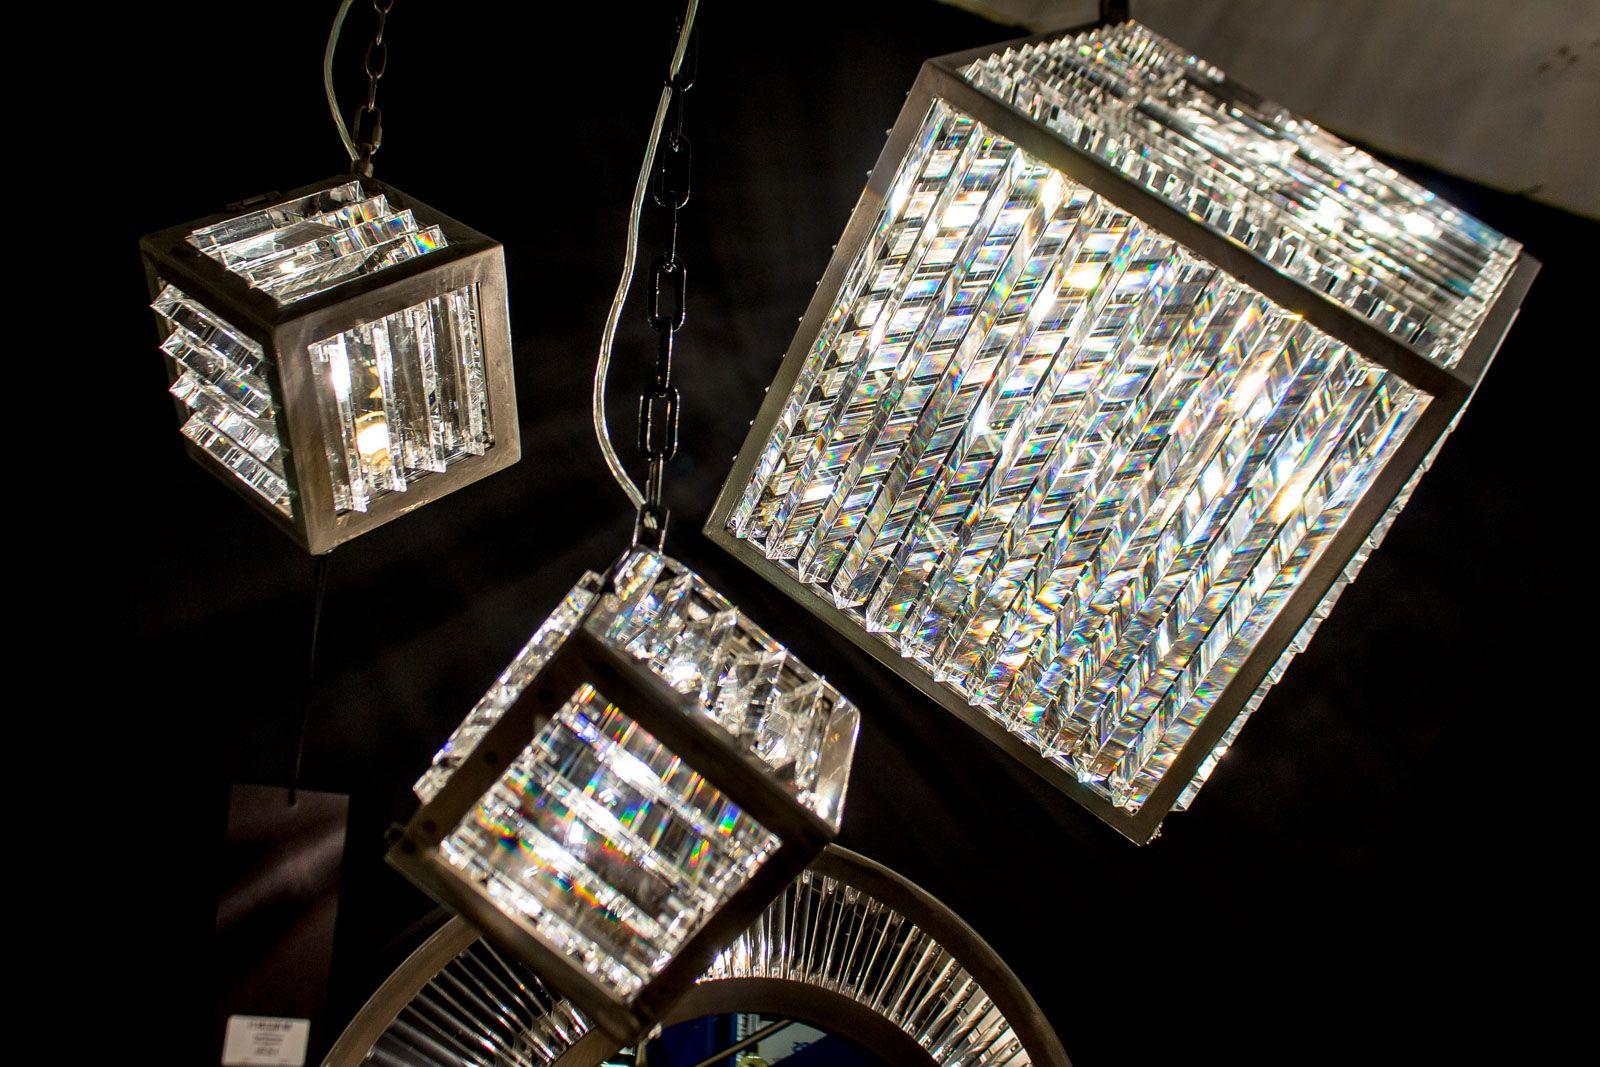 Extravagant Lamps By Timothy Oulton Designer Idee Lampen Und Leuchten